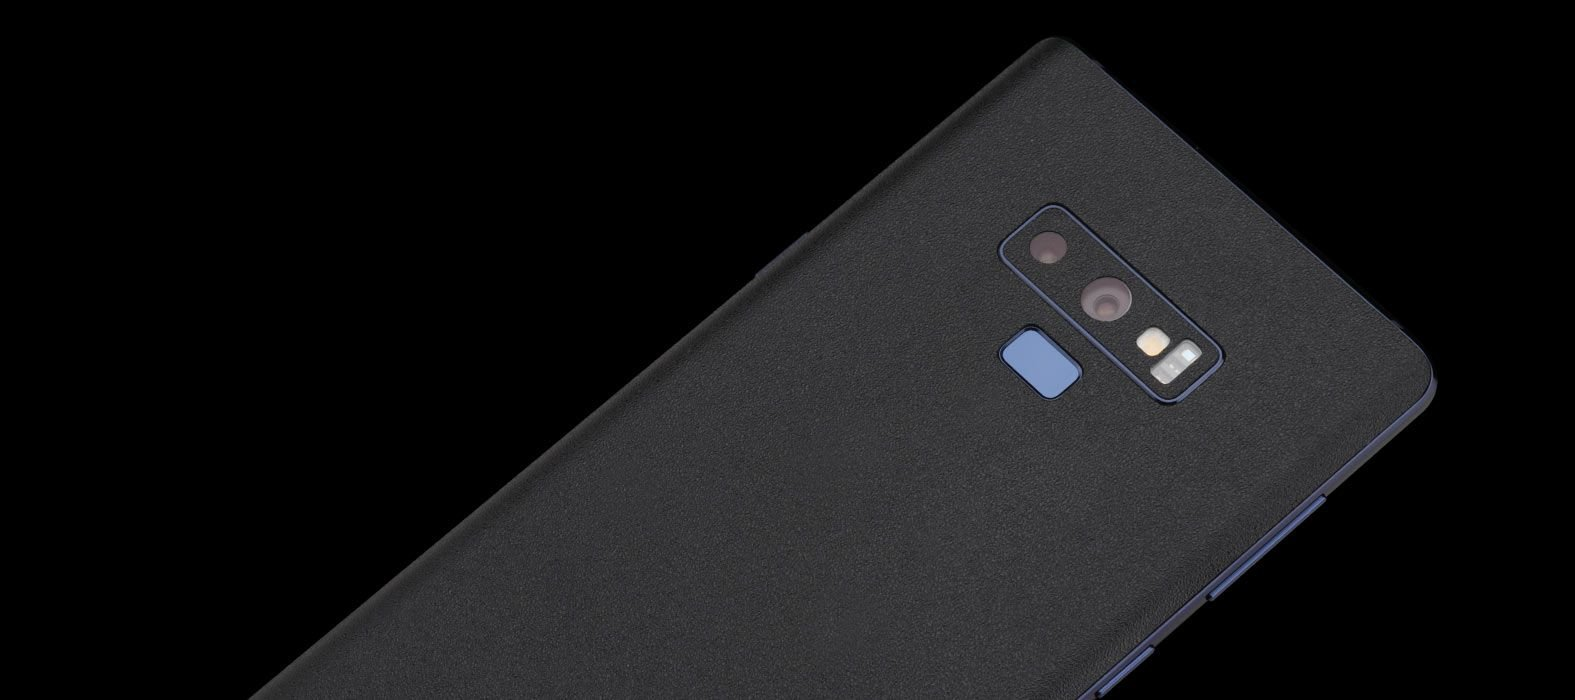 Galaxy Note 9 Black Sandstone Skins